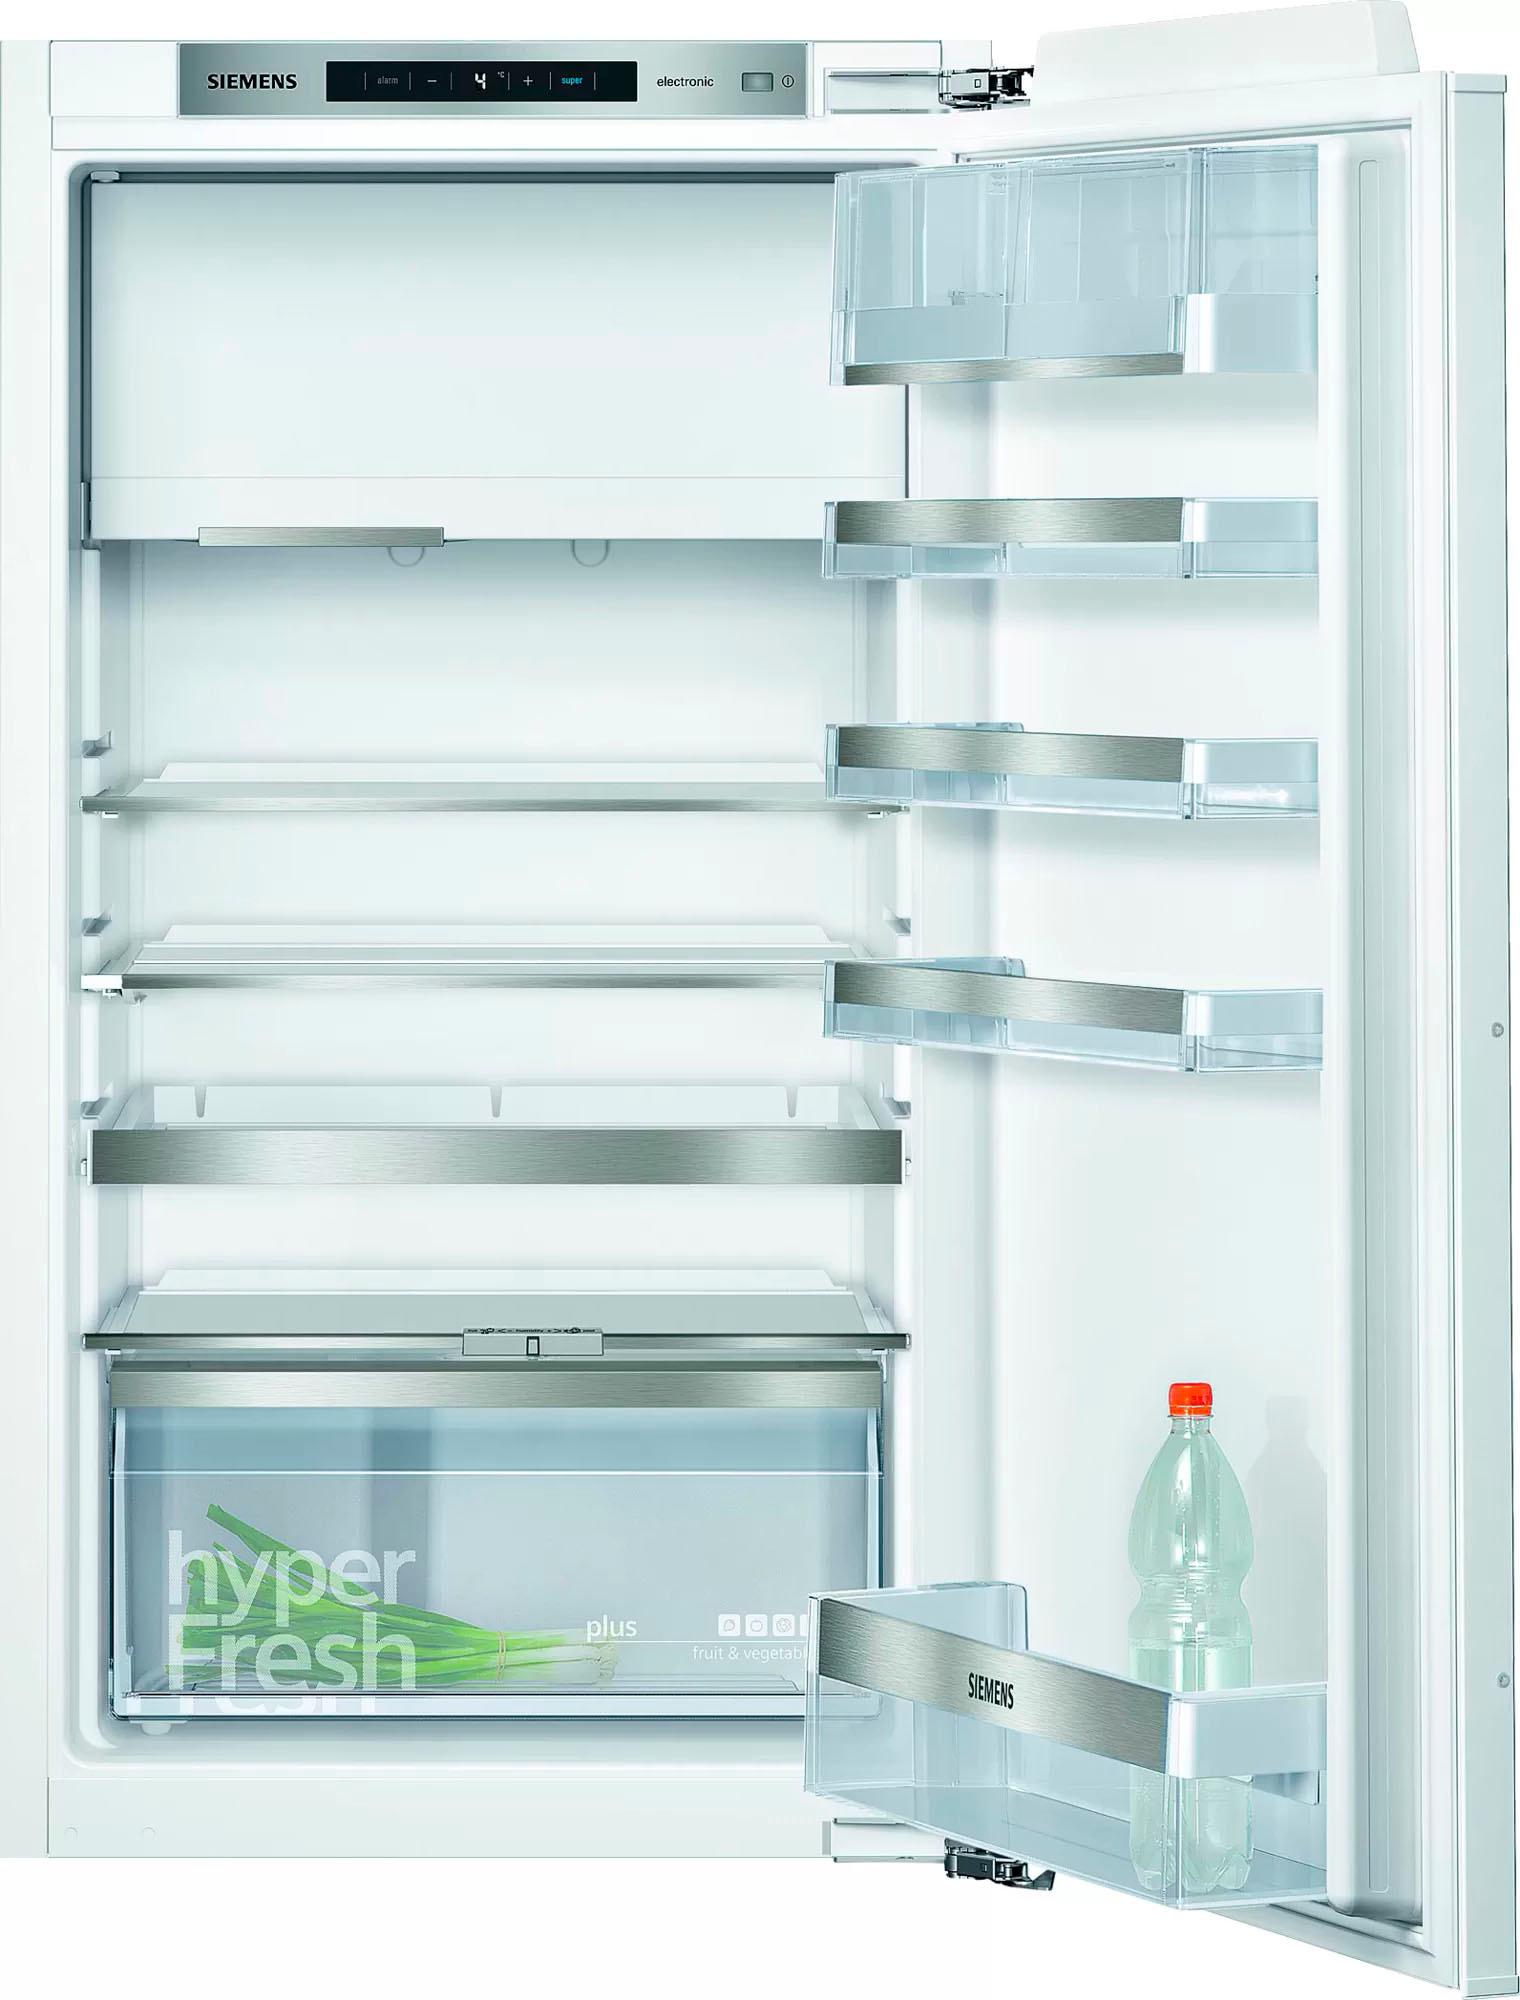 SIEMENS Einbaukühlgefrierkombination KI32LADF0 , iQ500